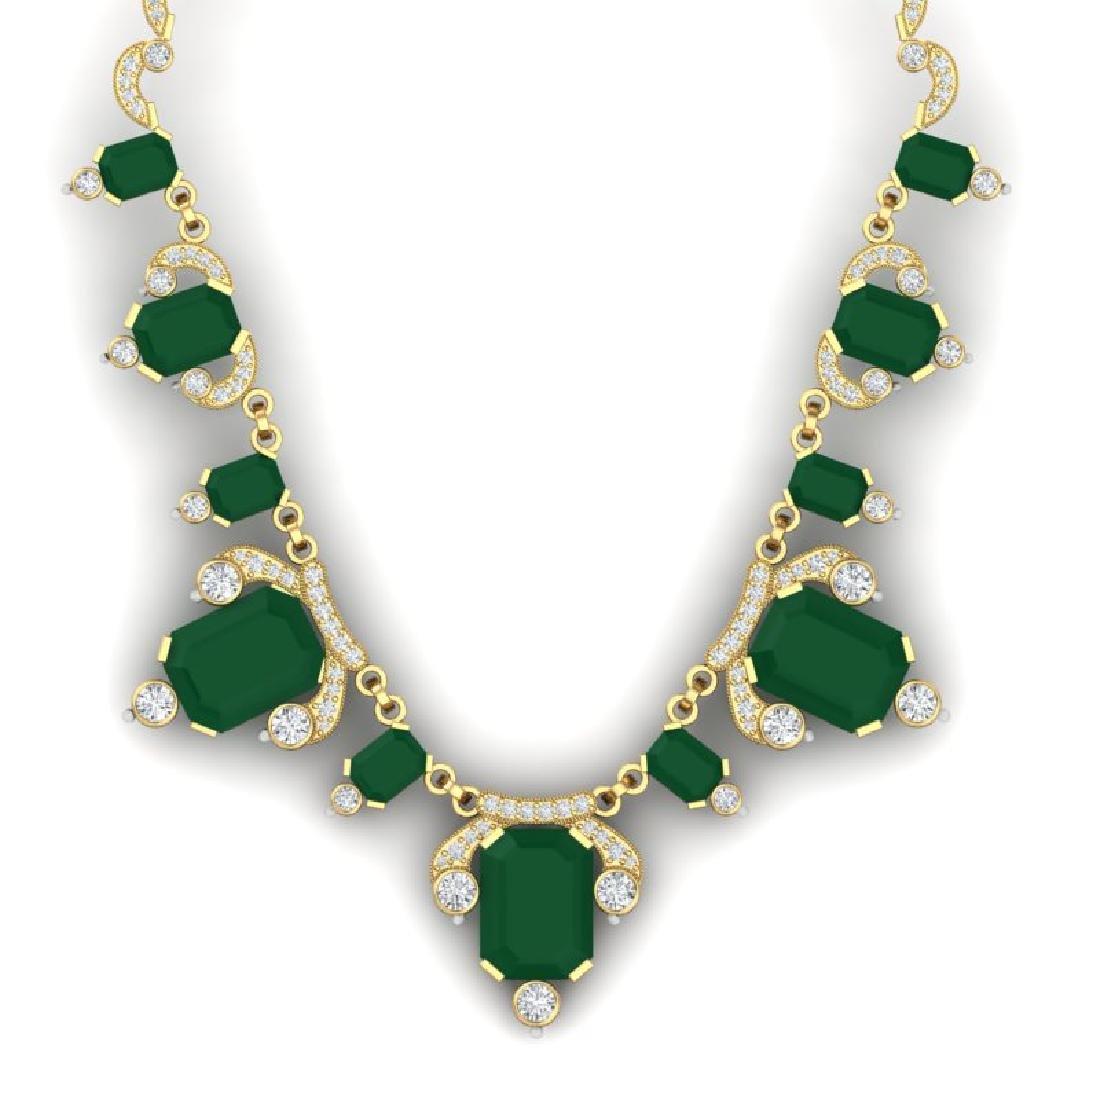 75.21 CTW Royalty Emerald & VS Diamond Necklace 18K